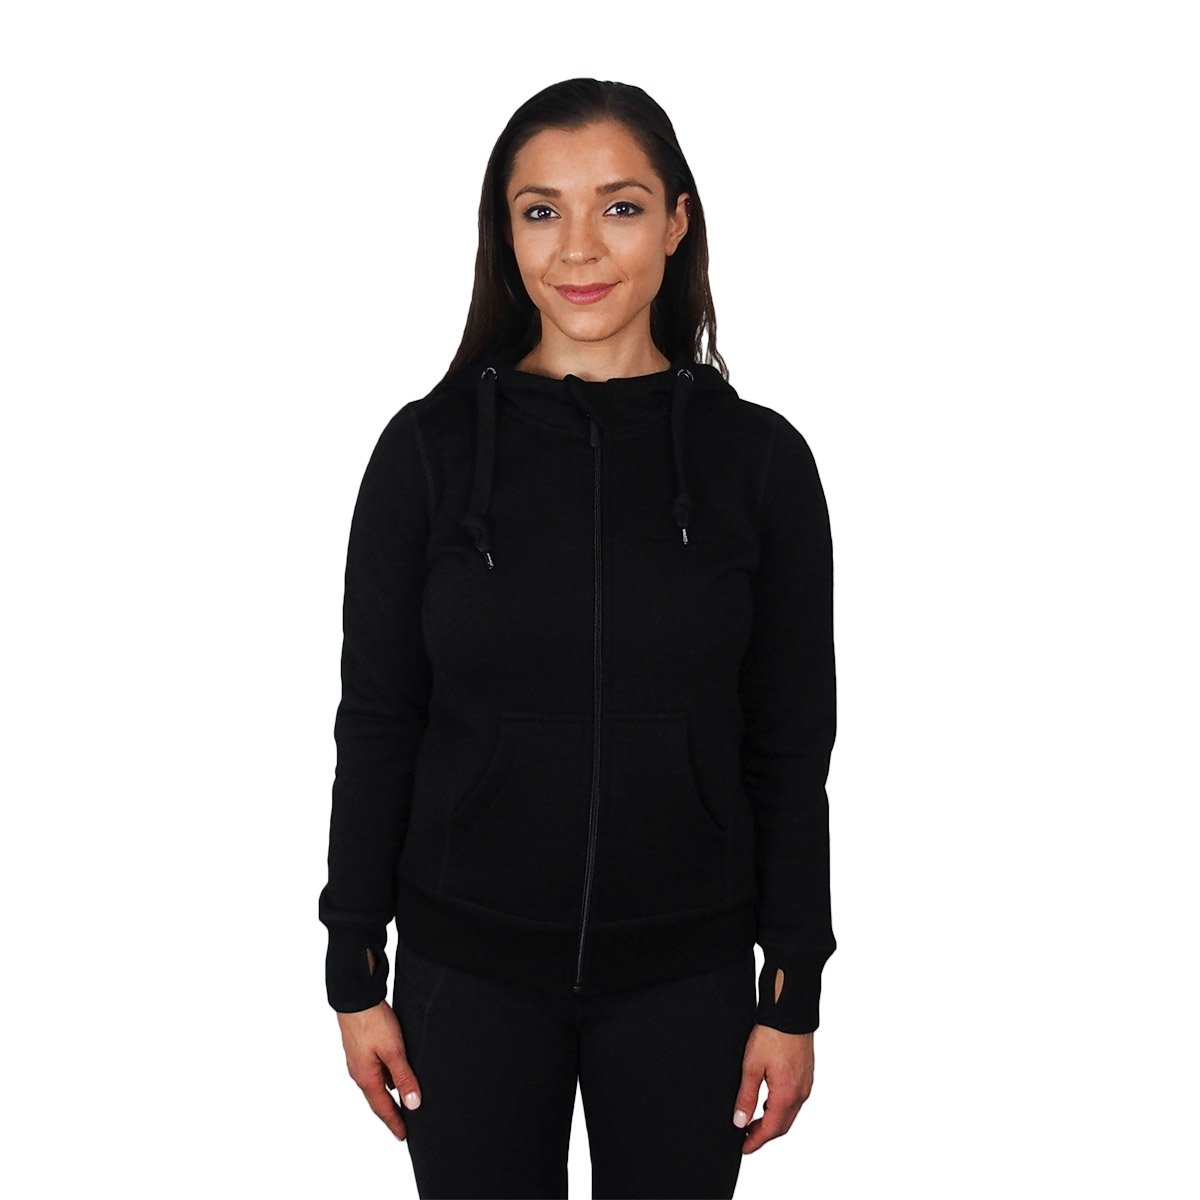 Minus33 Merino Wool Aleutian Women's Expedition Full Zip Hoody Black Medium